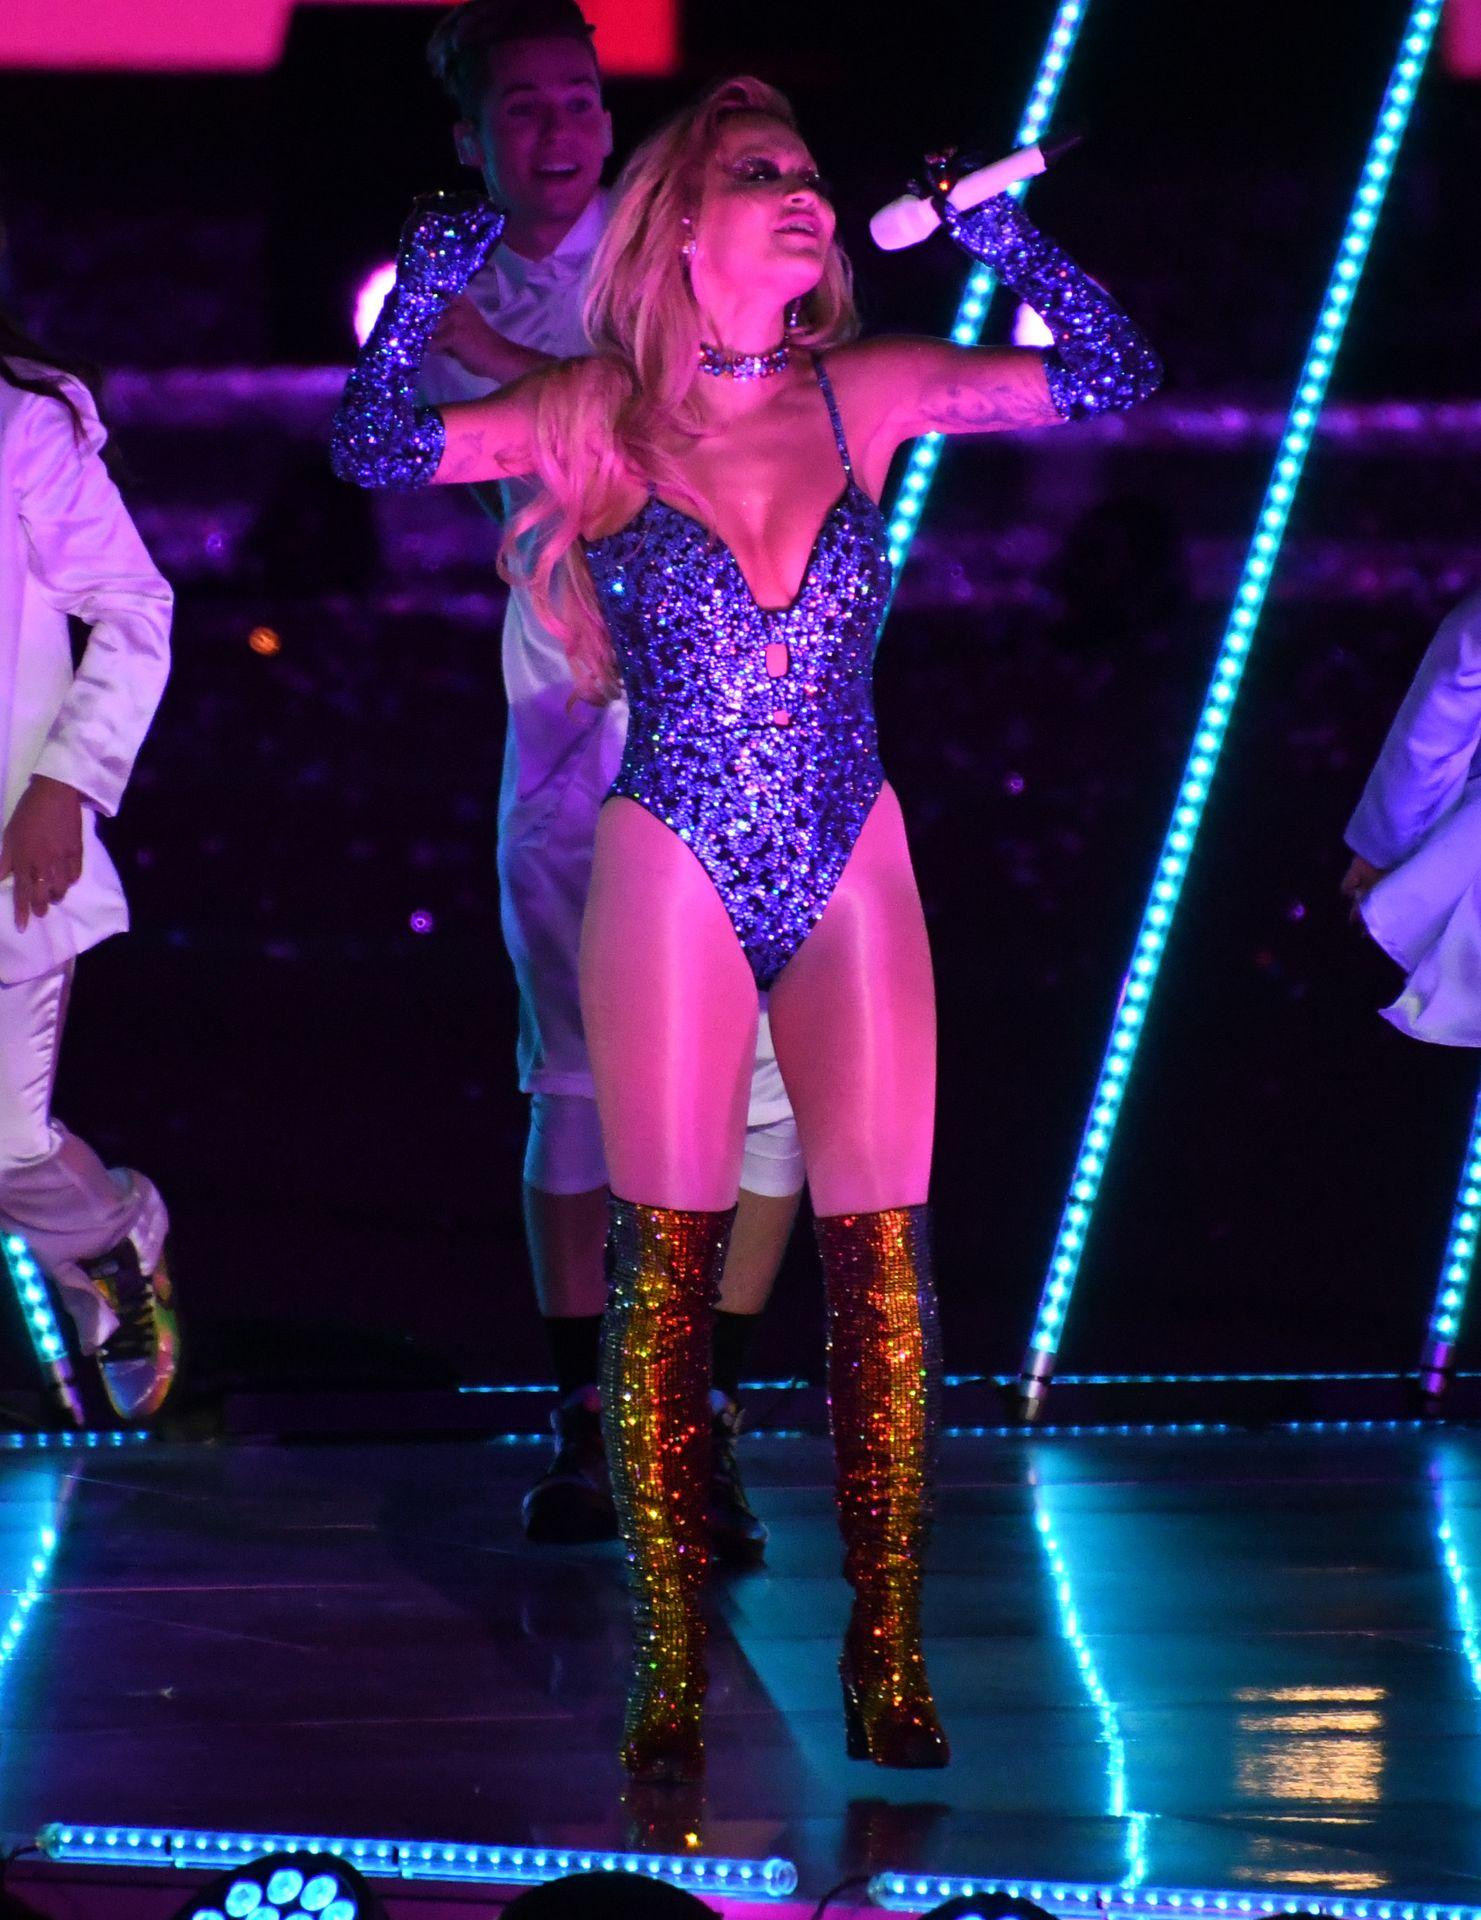 Rita Ora Performs at Sydney Gay and Lesbian Mardi Gras Parade (130 Photos)